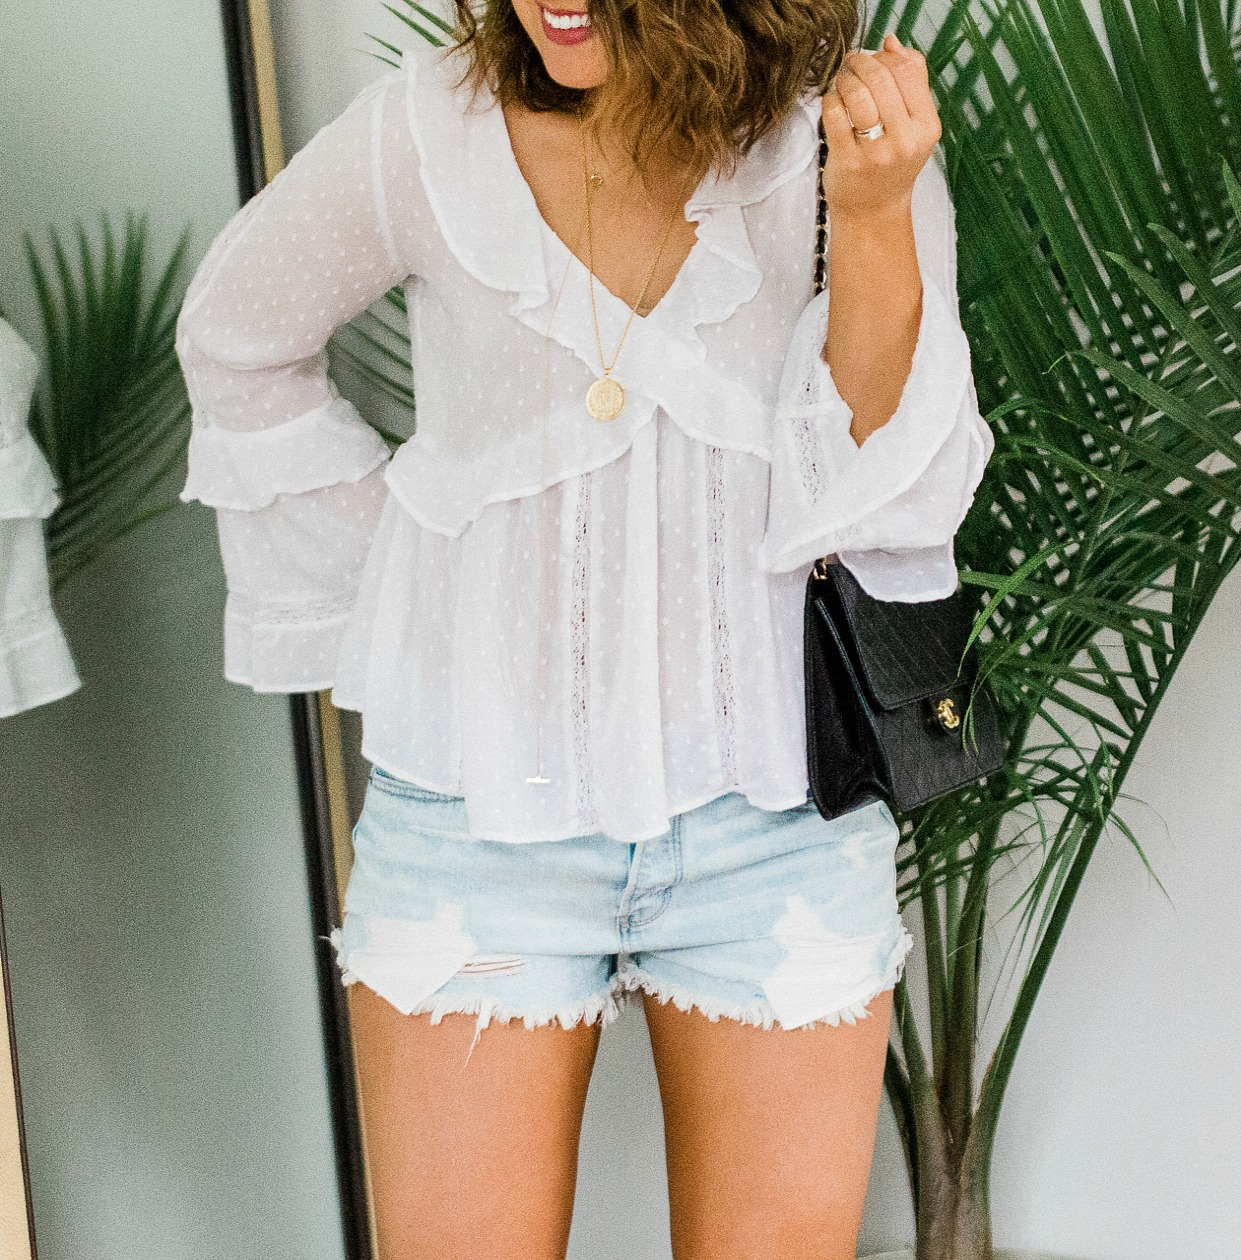 ae boho white blouse, ae tomgirl shorts, boho white blouse, xo samantha brooke, sam brooke photo, lifestyle blogger, white blouse shorts outfit, white blouse cutoffs outfit